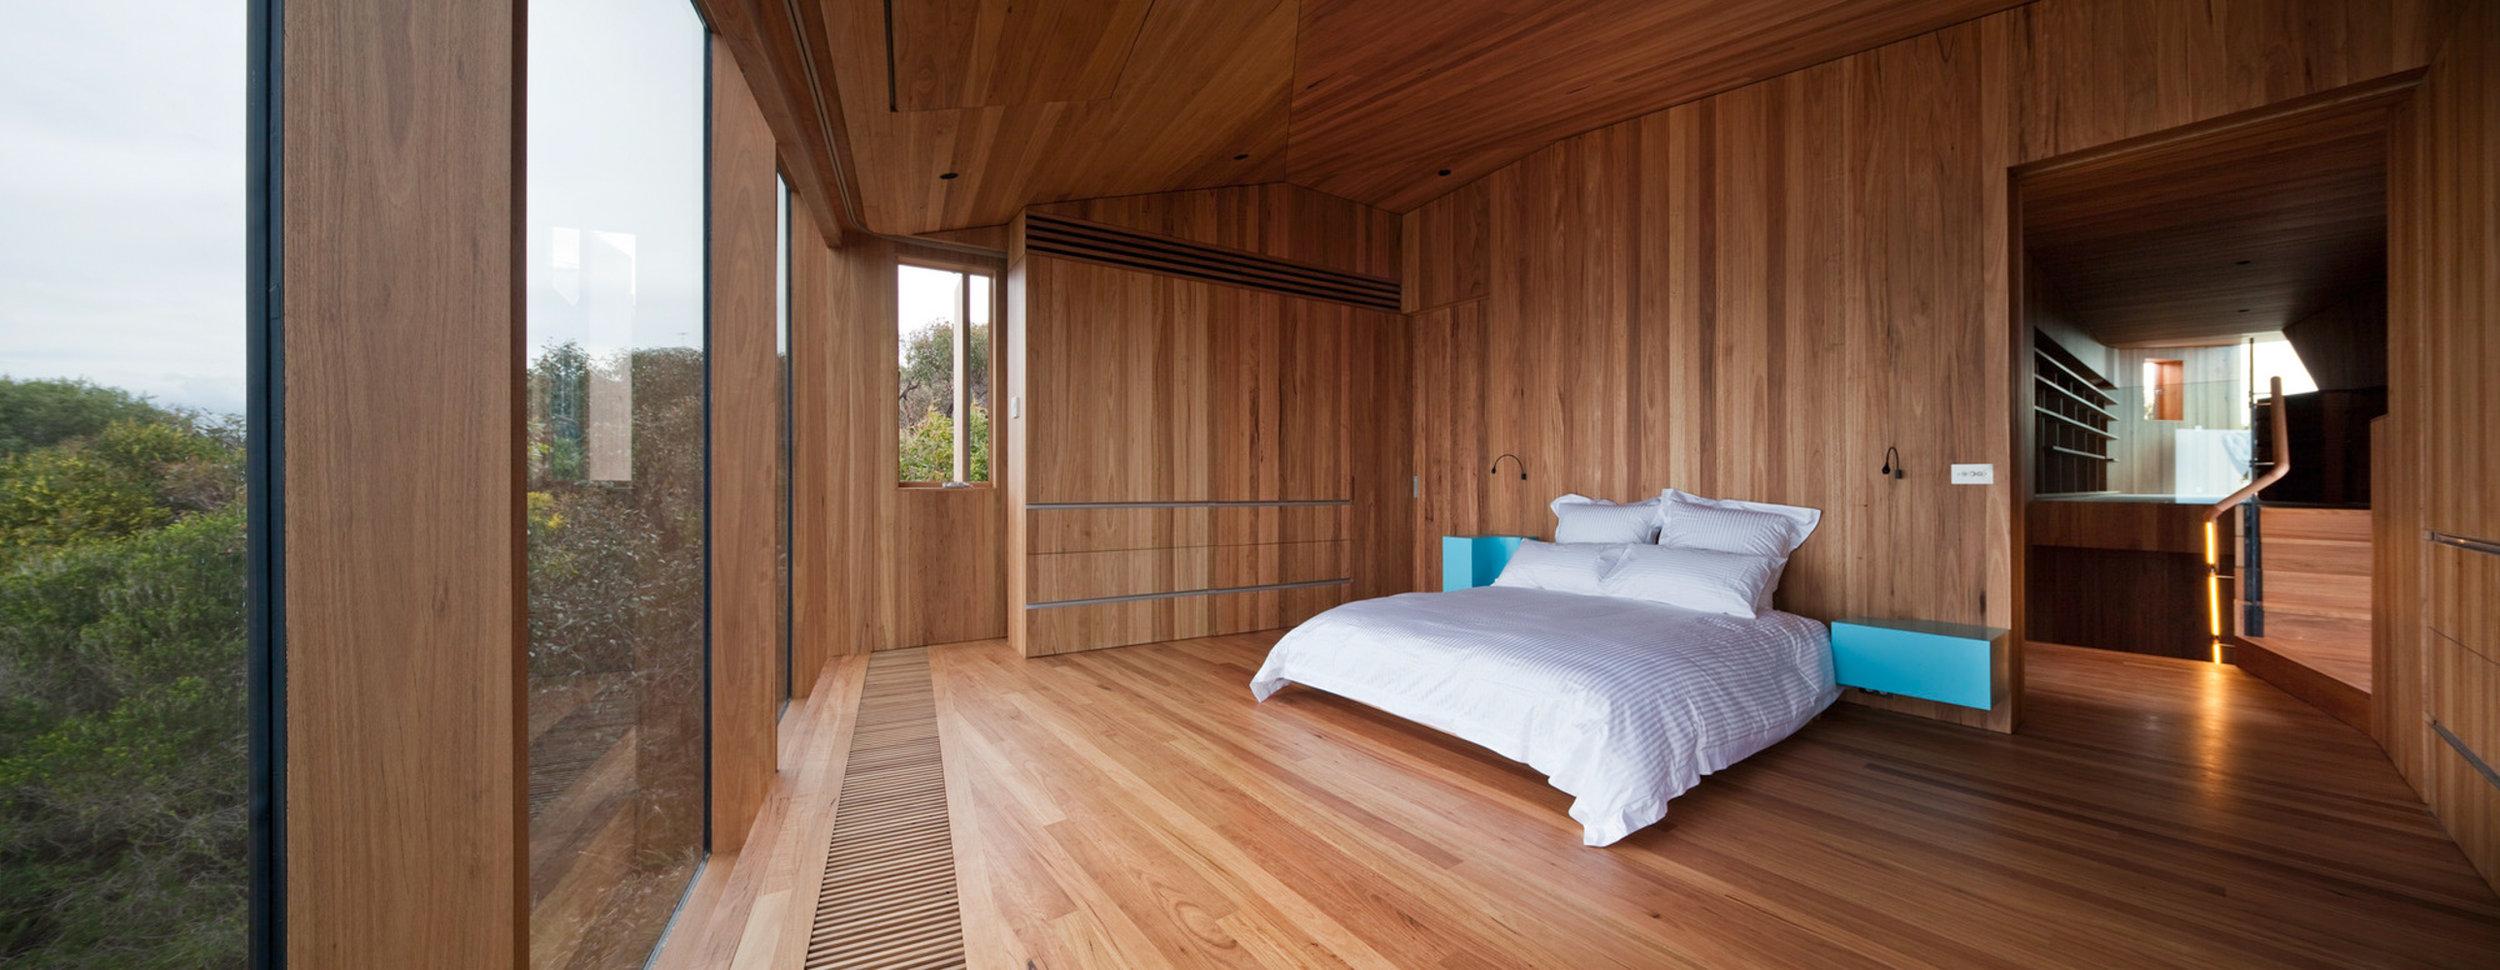 fairhaven-beach-house-john-wardle-architects-the-design-emotive-08.jpg